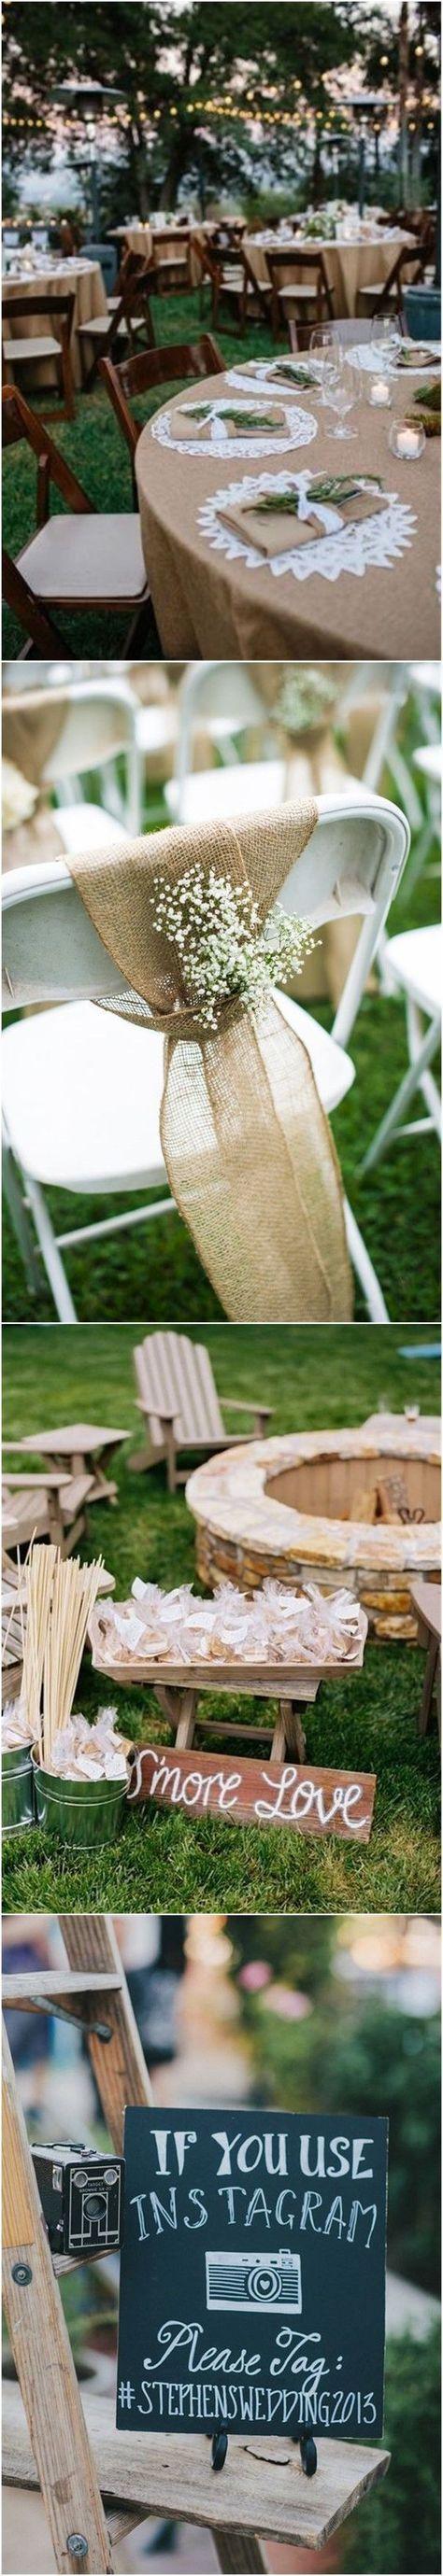 Wedding Decorations » 22 Rustic Backyard Wedding Decoration Ideas on A Budget » ❤️ More: http://www.weddinginclude.com/2017/08/rustic-backyard-wedding-decoration-ideas-on-a-budget/ #budgetweddingdecorations #weddingplanningonabudget